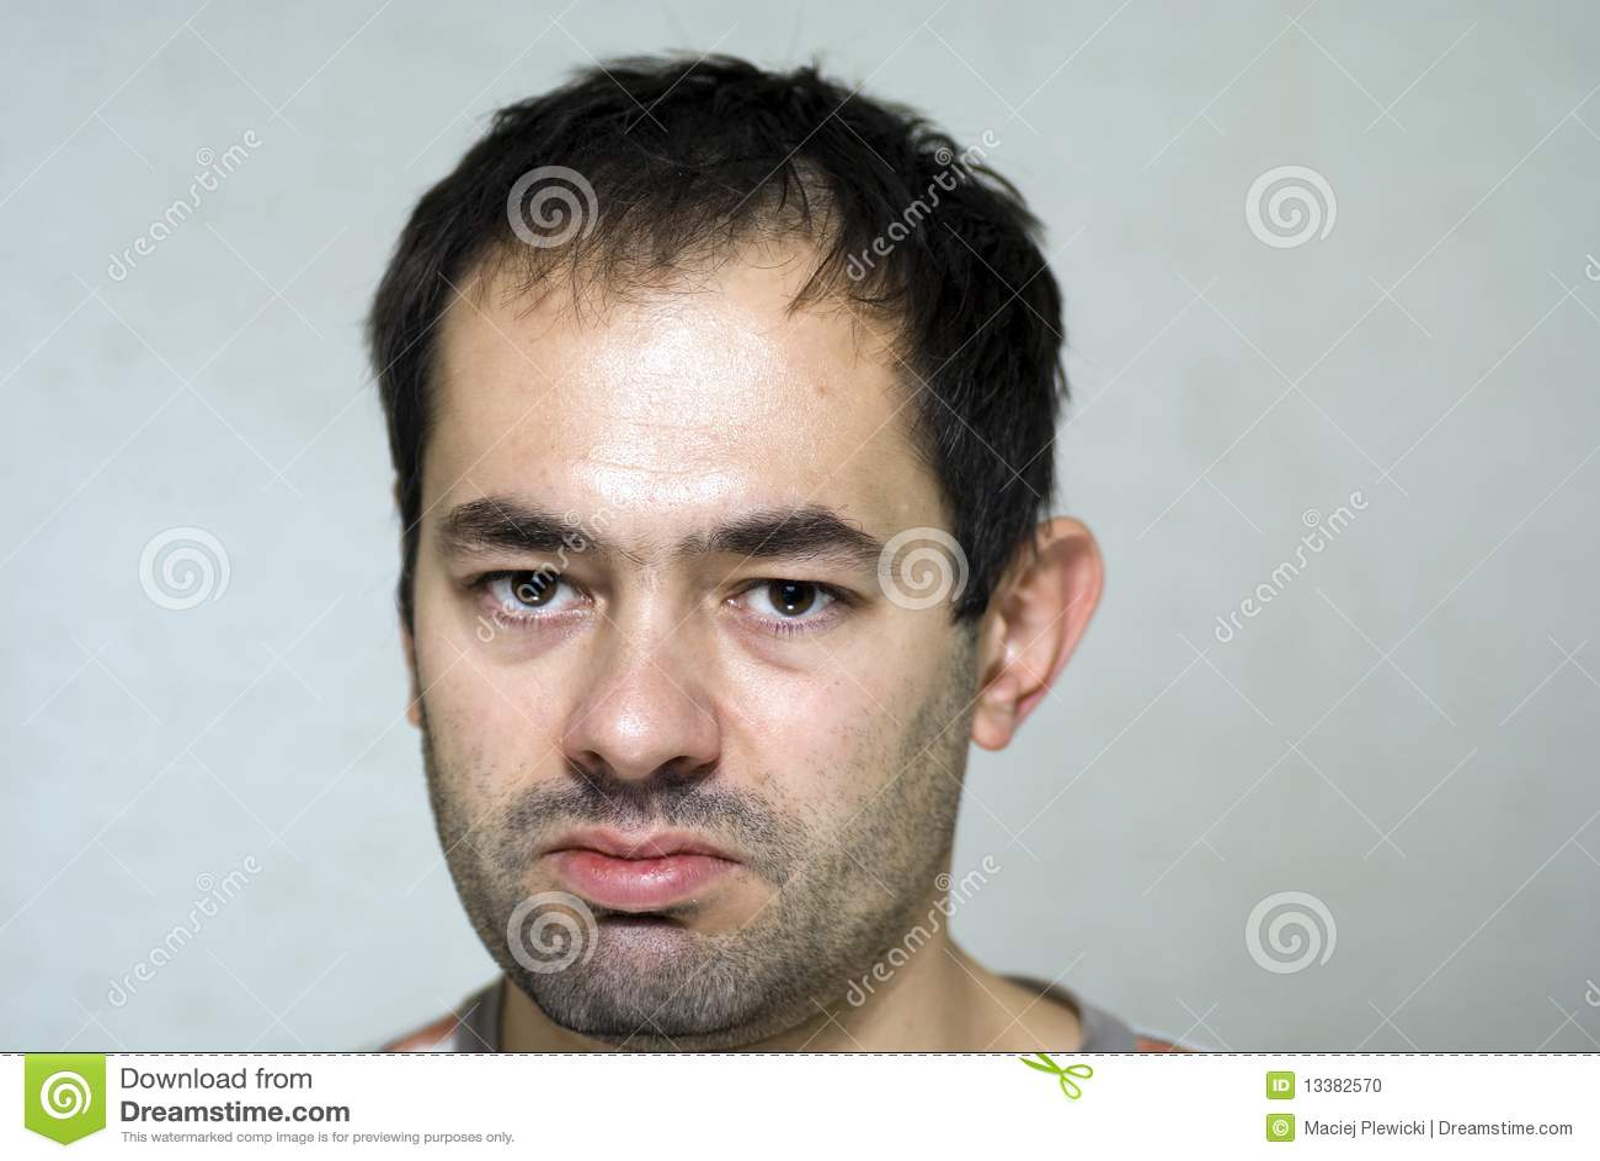 Sick Person Stock Photo. Image Of Beard, Casual, Failure